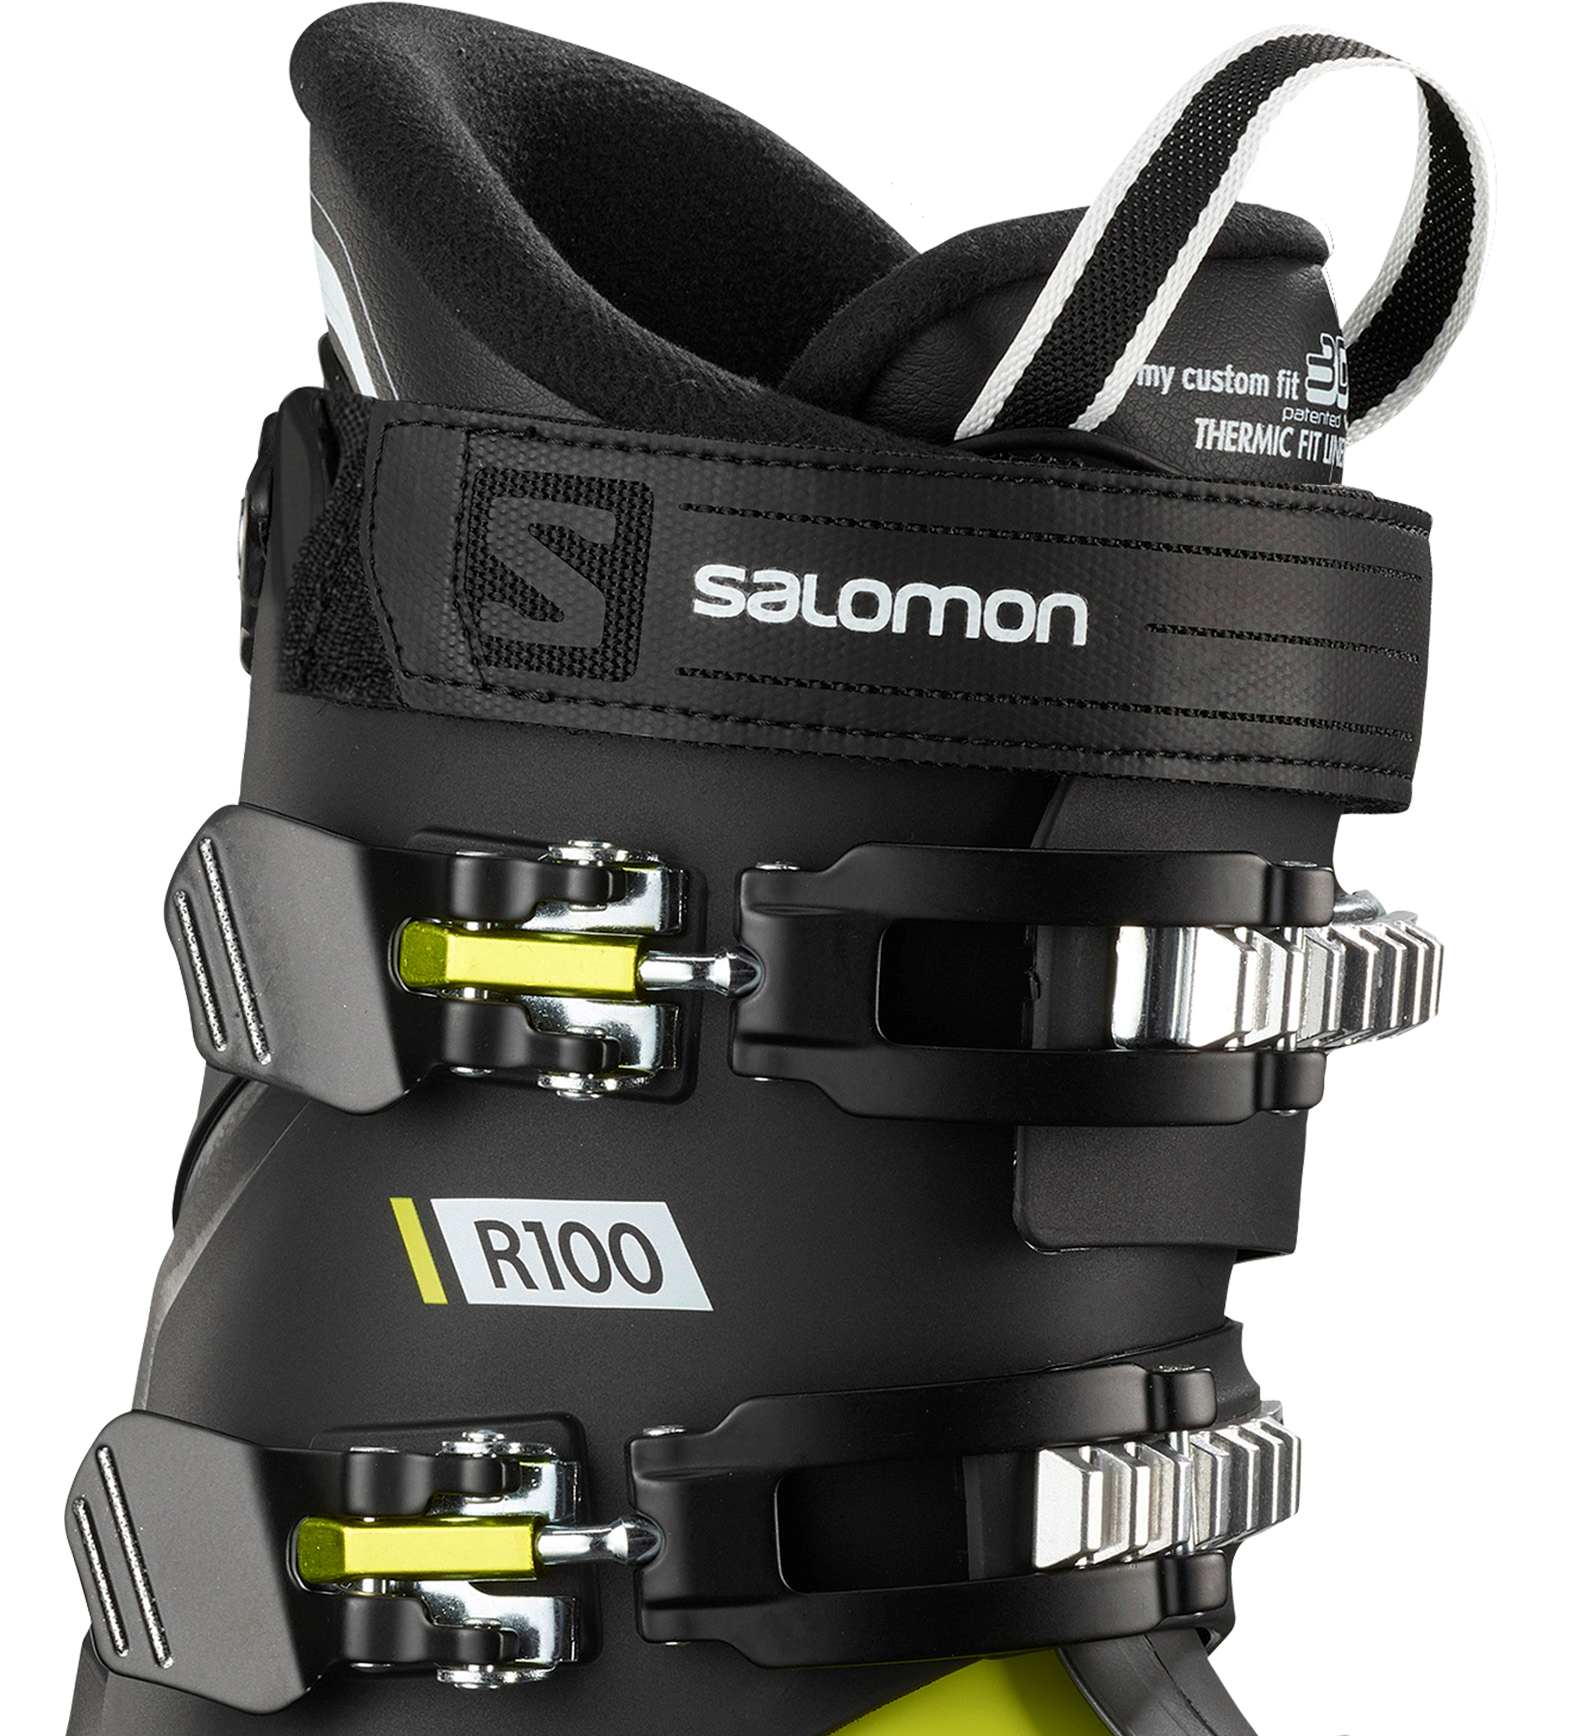 Buty Salomon SPRO R100 2020